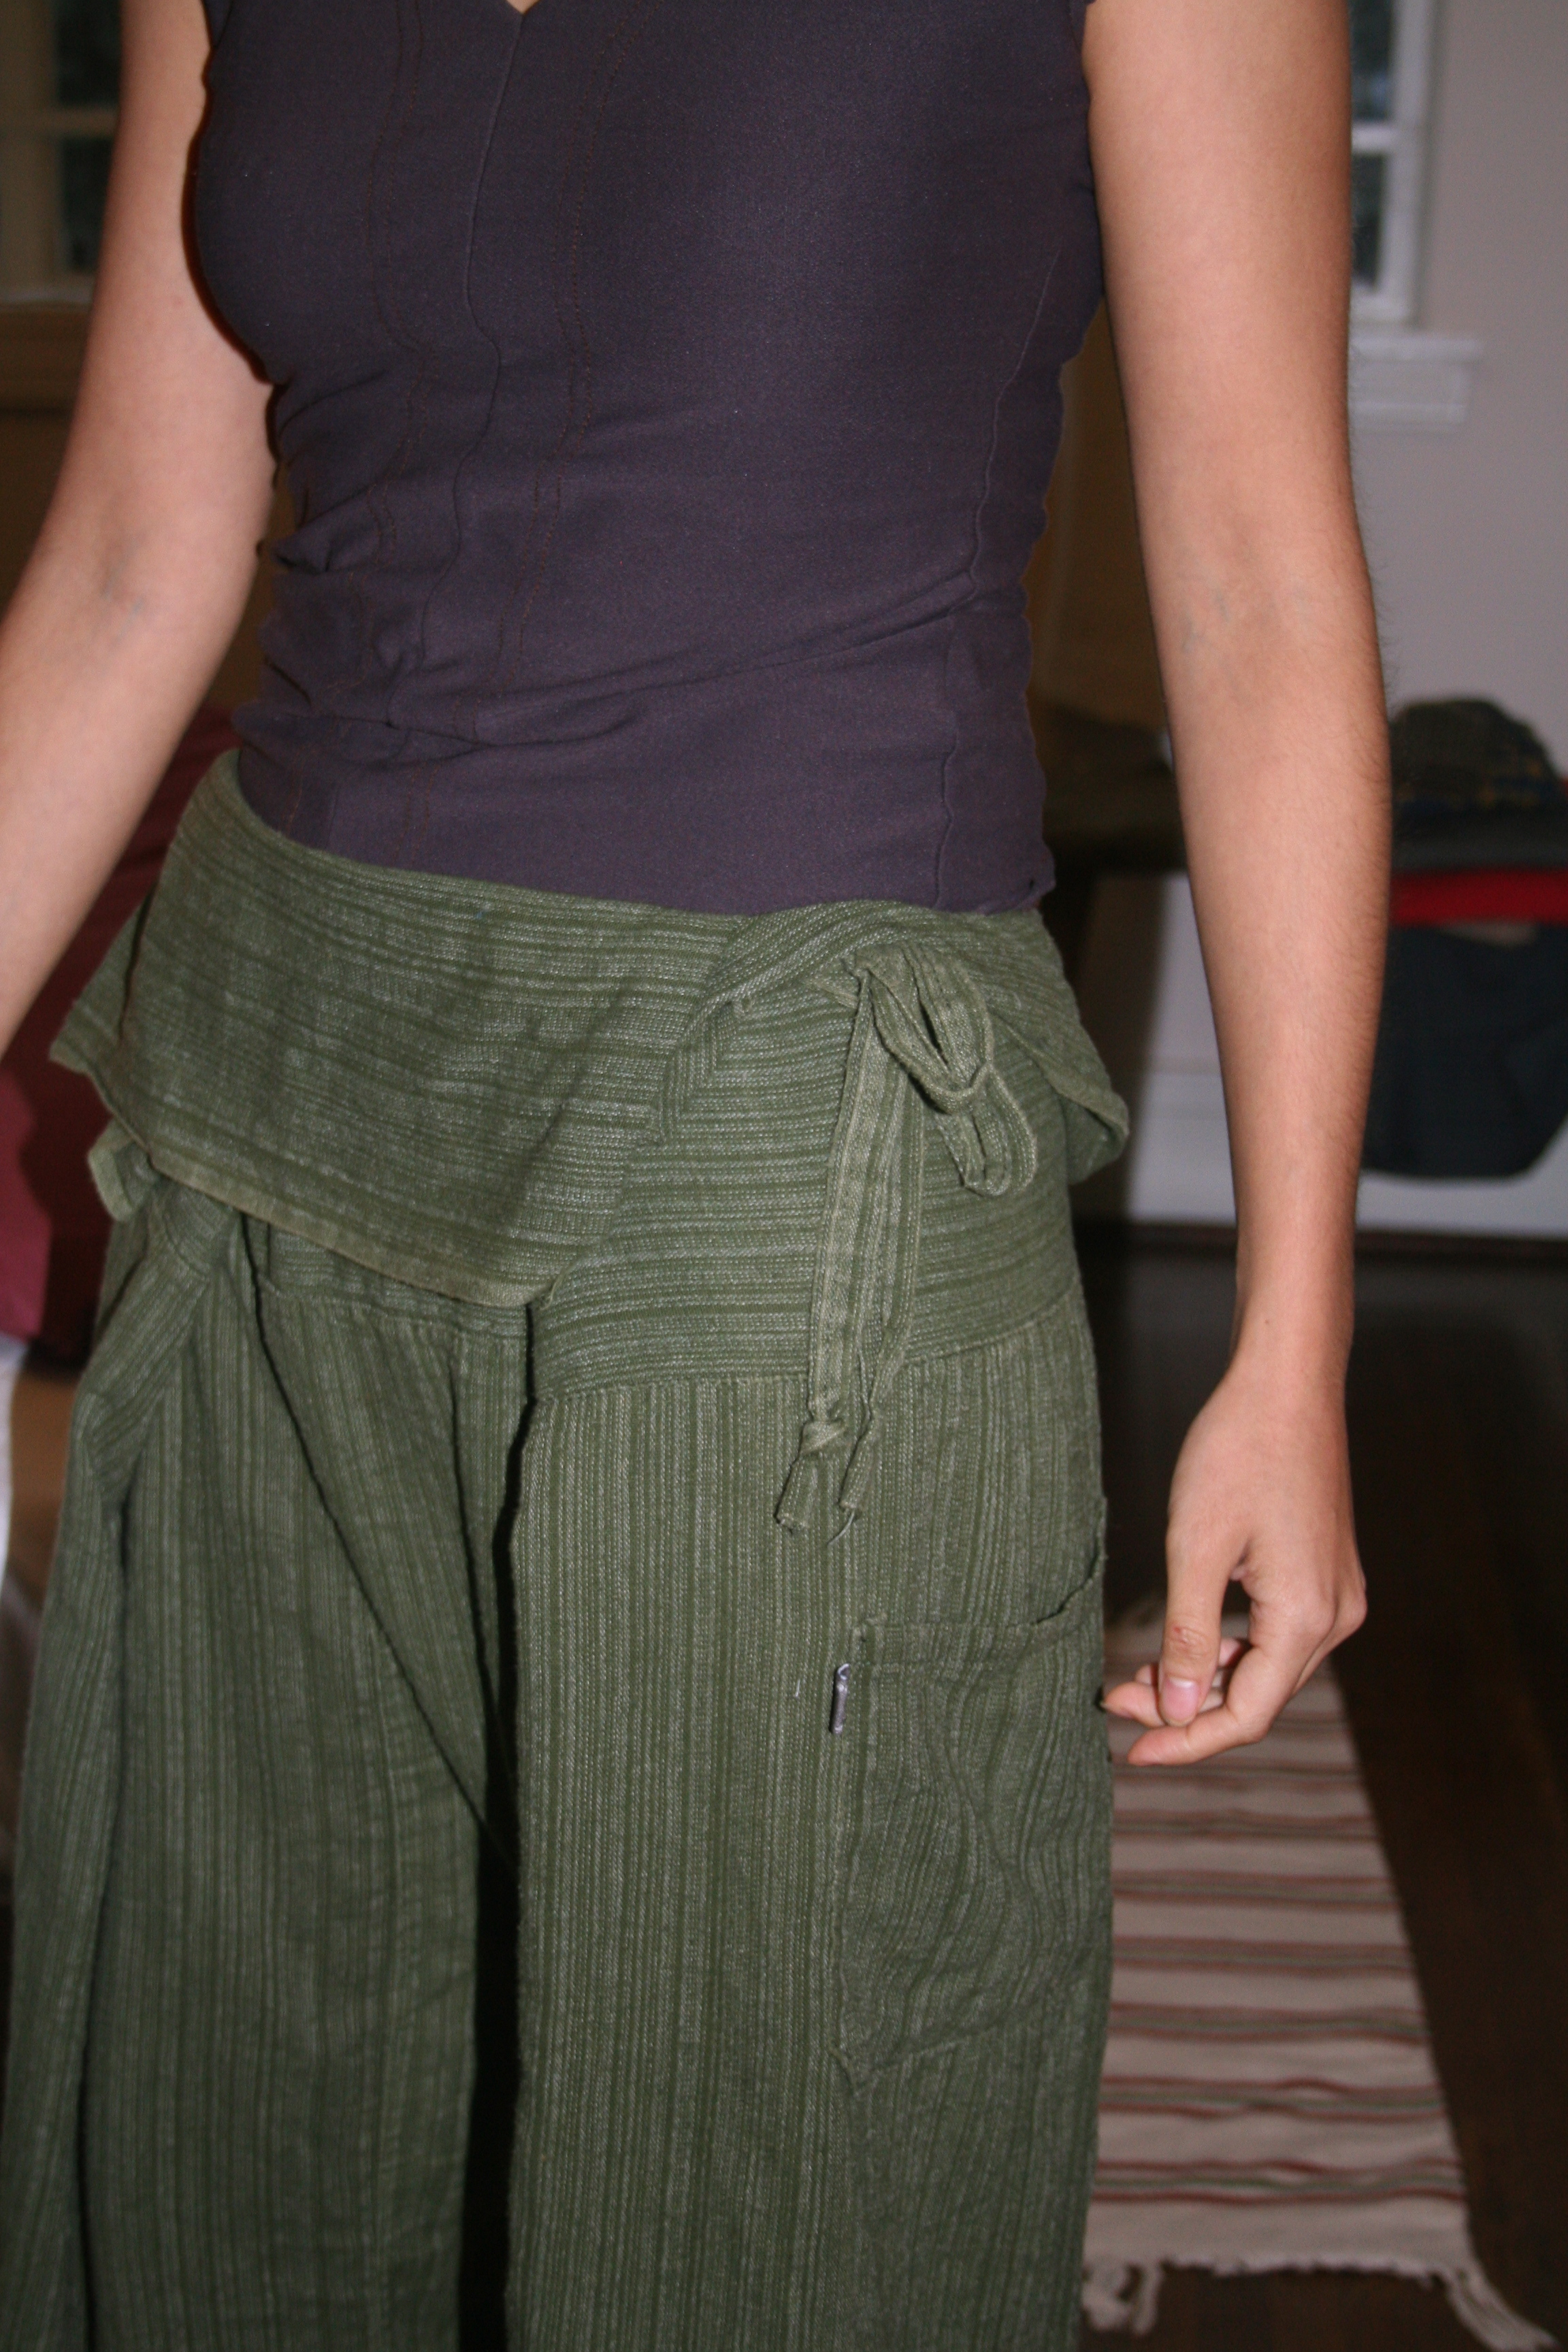 ed463a2ad70 Thai fisherman pants - Wikipedia